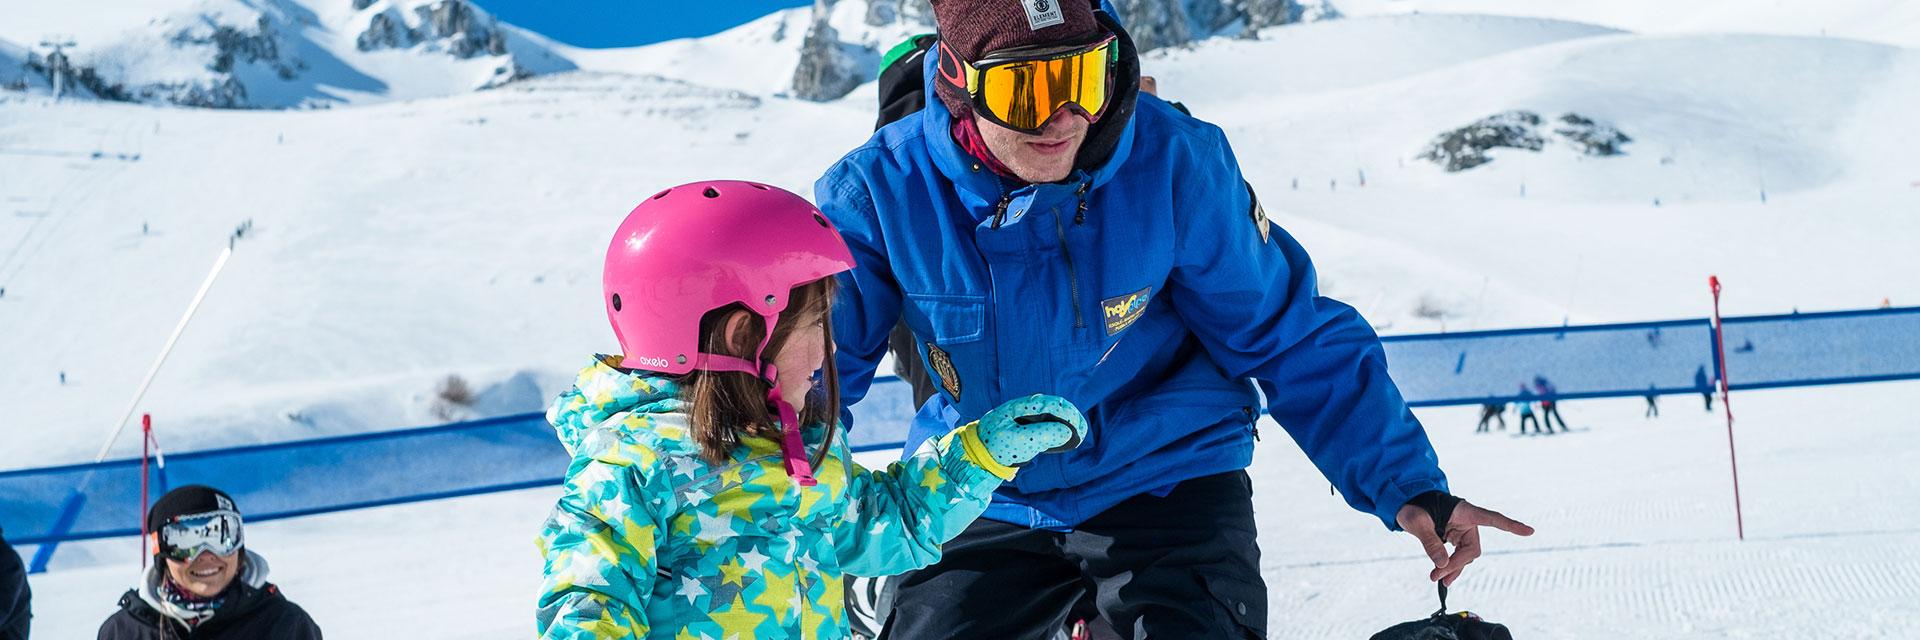 SnowboardEscuelaSanIsidroPortLaEscuela